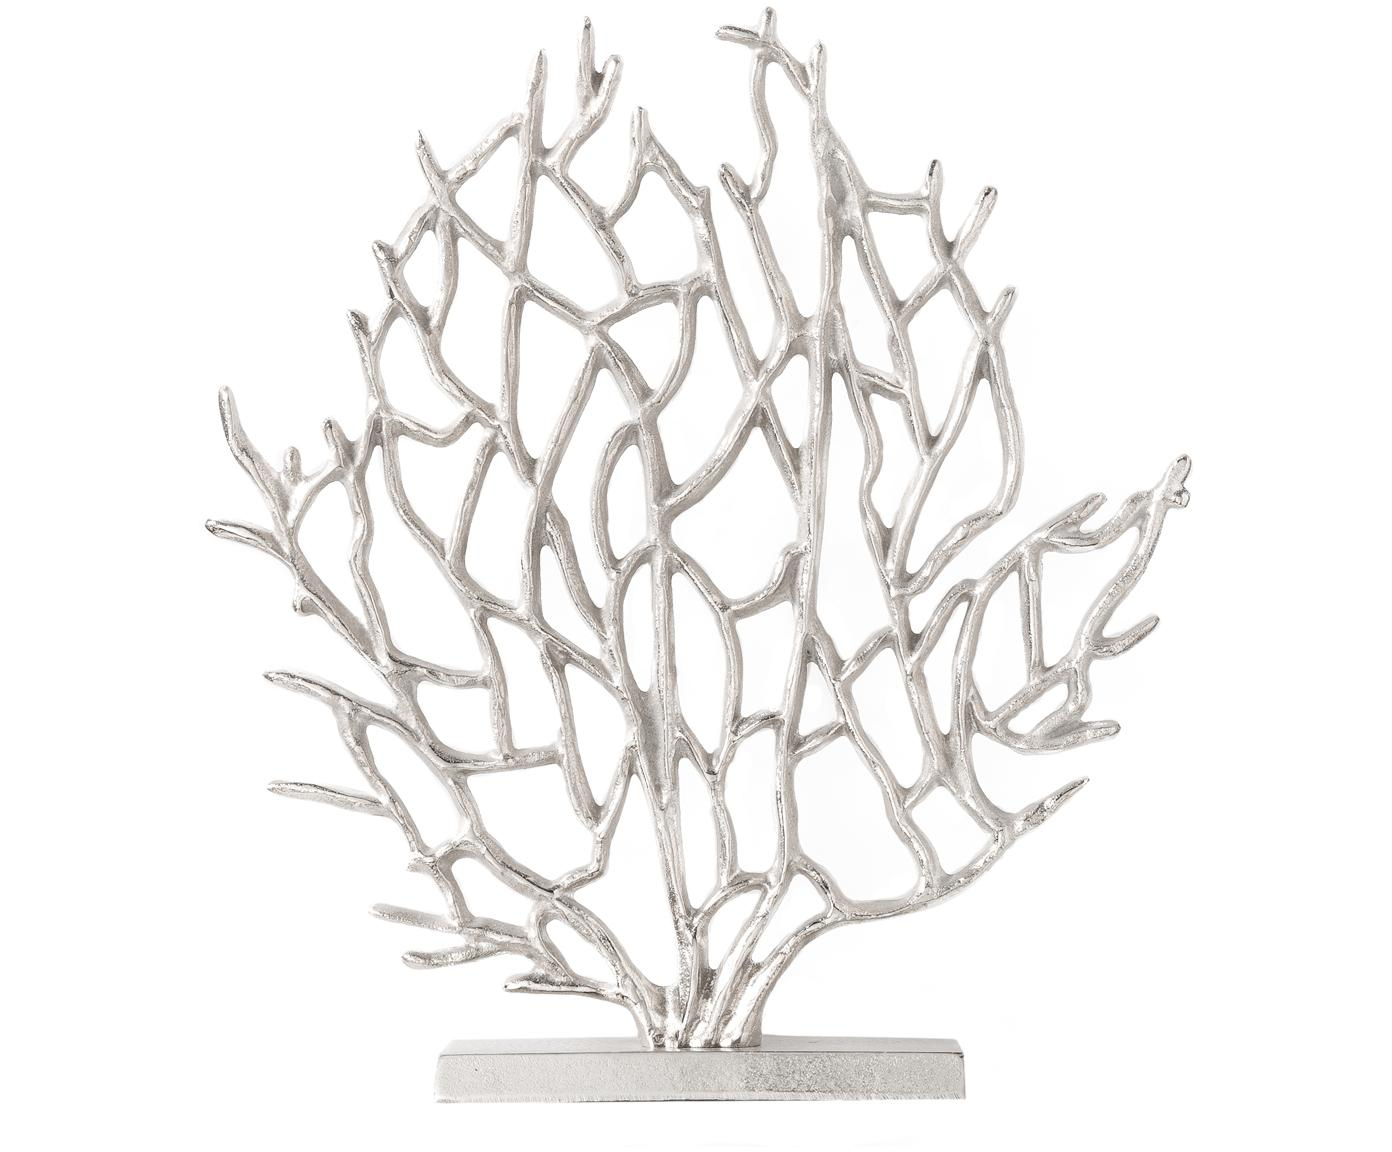 Deko-Objekt Dundee, Aluminium, Aluminium, 33 x 37 cm